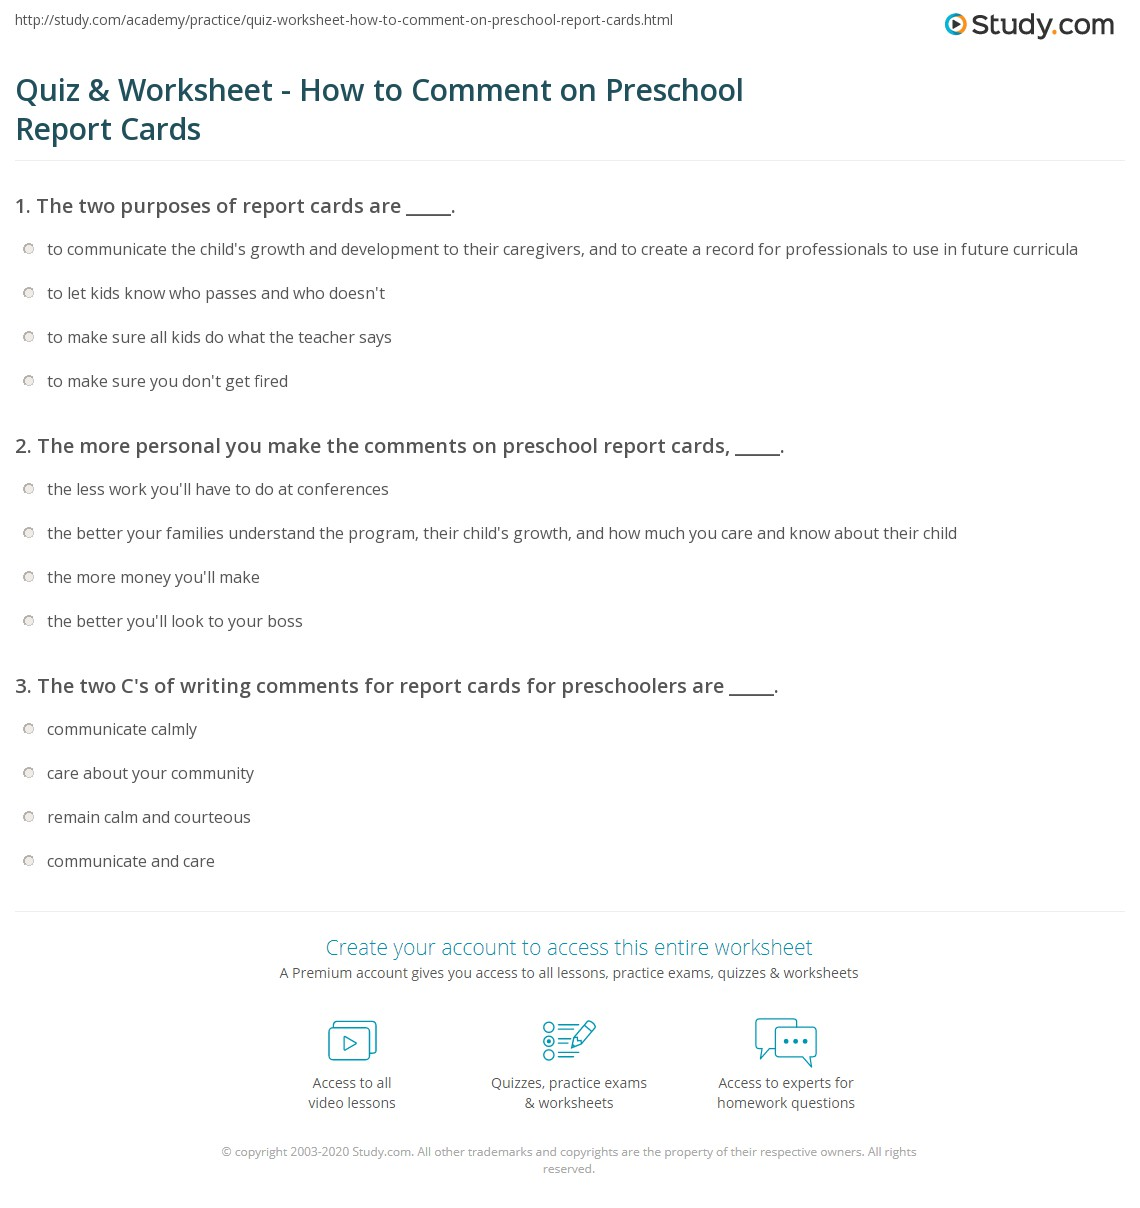 Workbooks impulsivity worksheets : Quiz & Worksheet - How to Comment on Preschool Report Cards ...